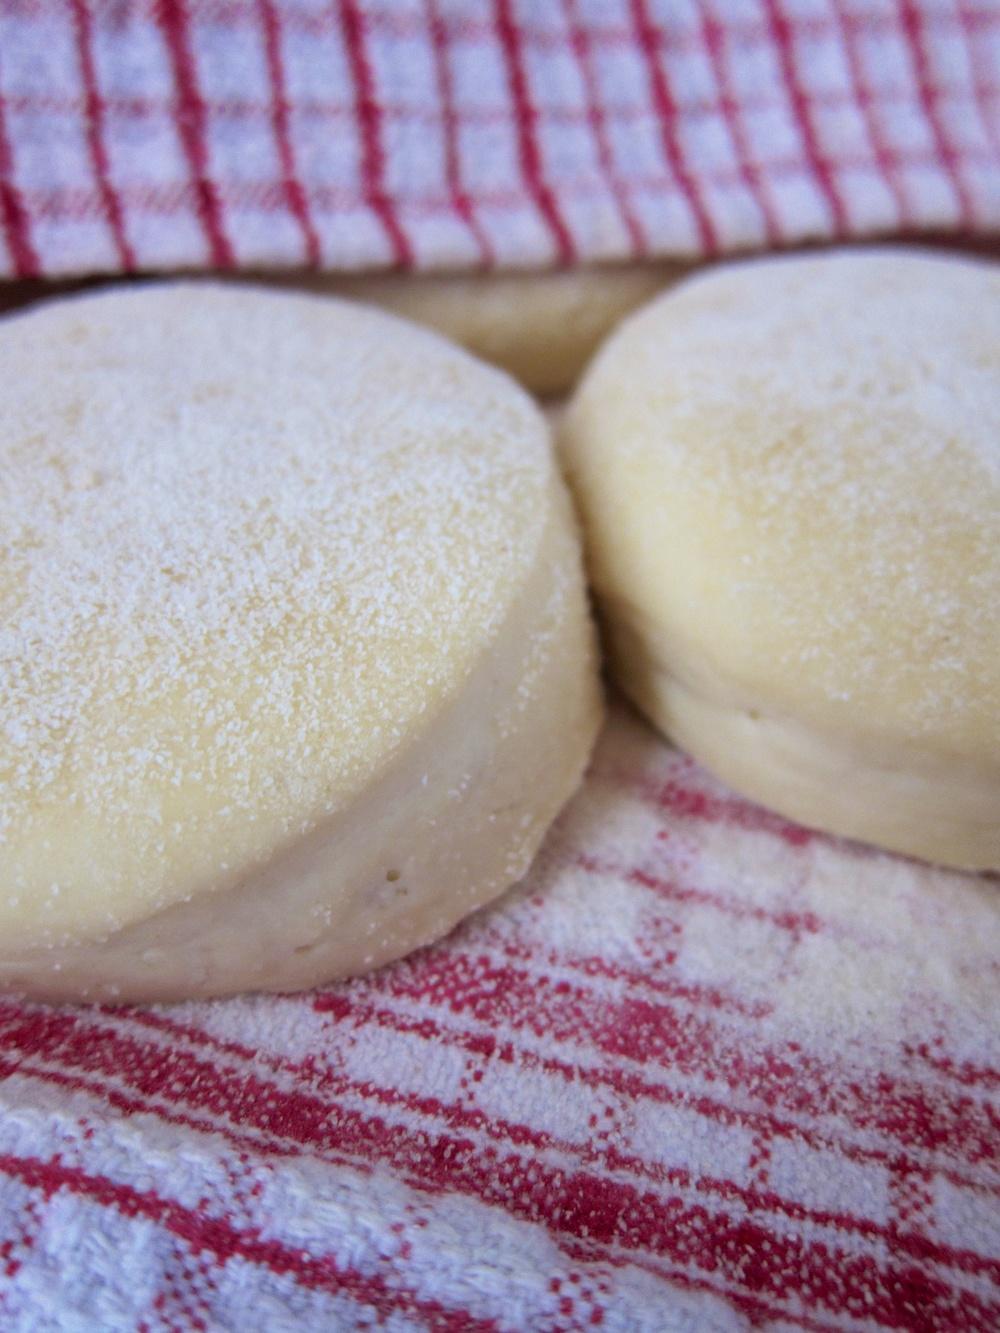 Muffins_7.jpg